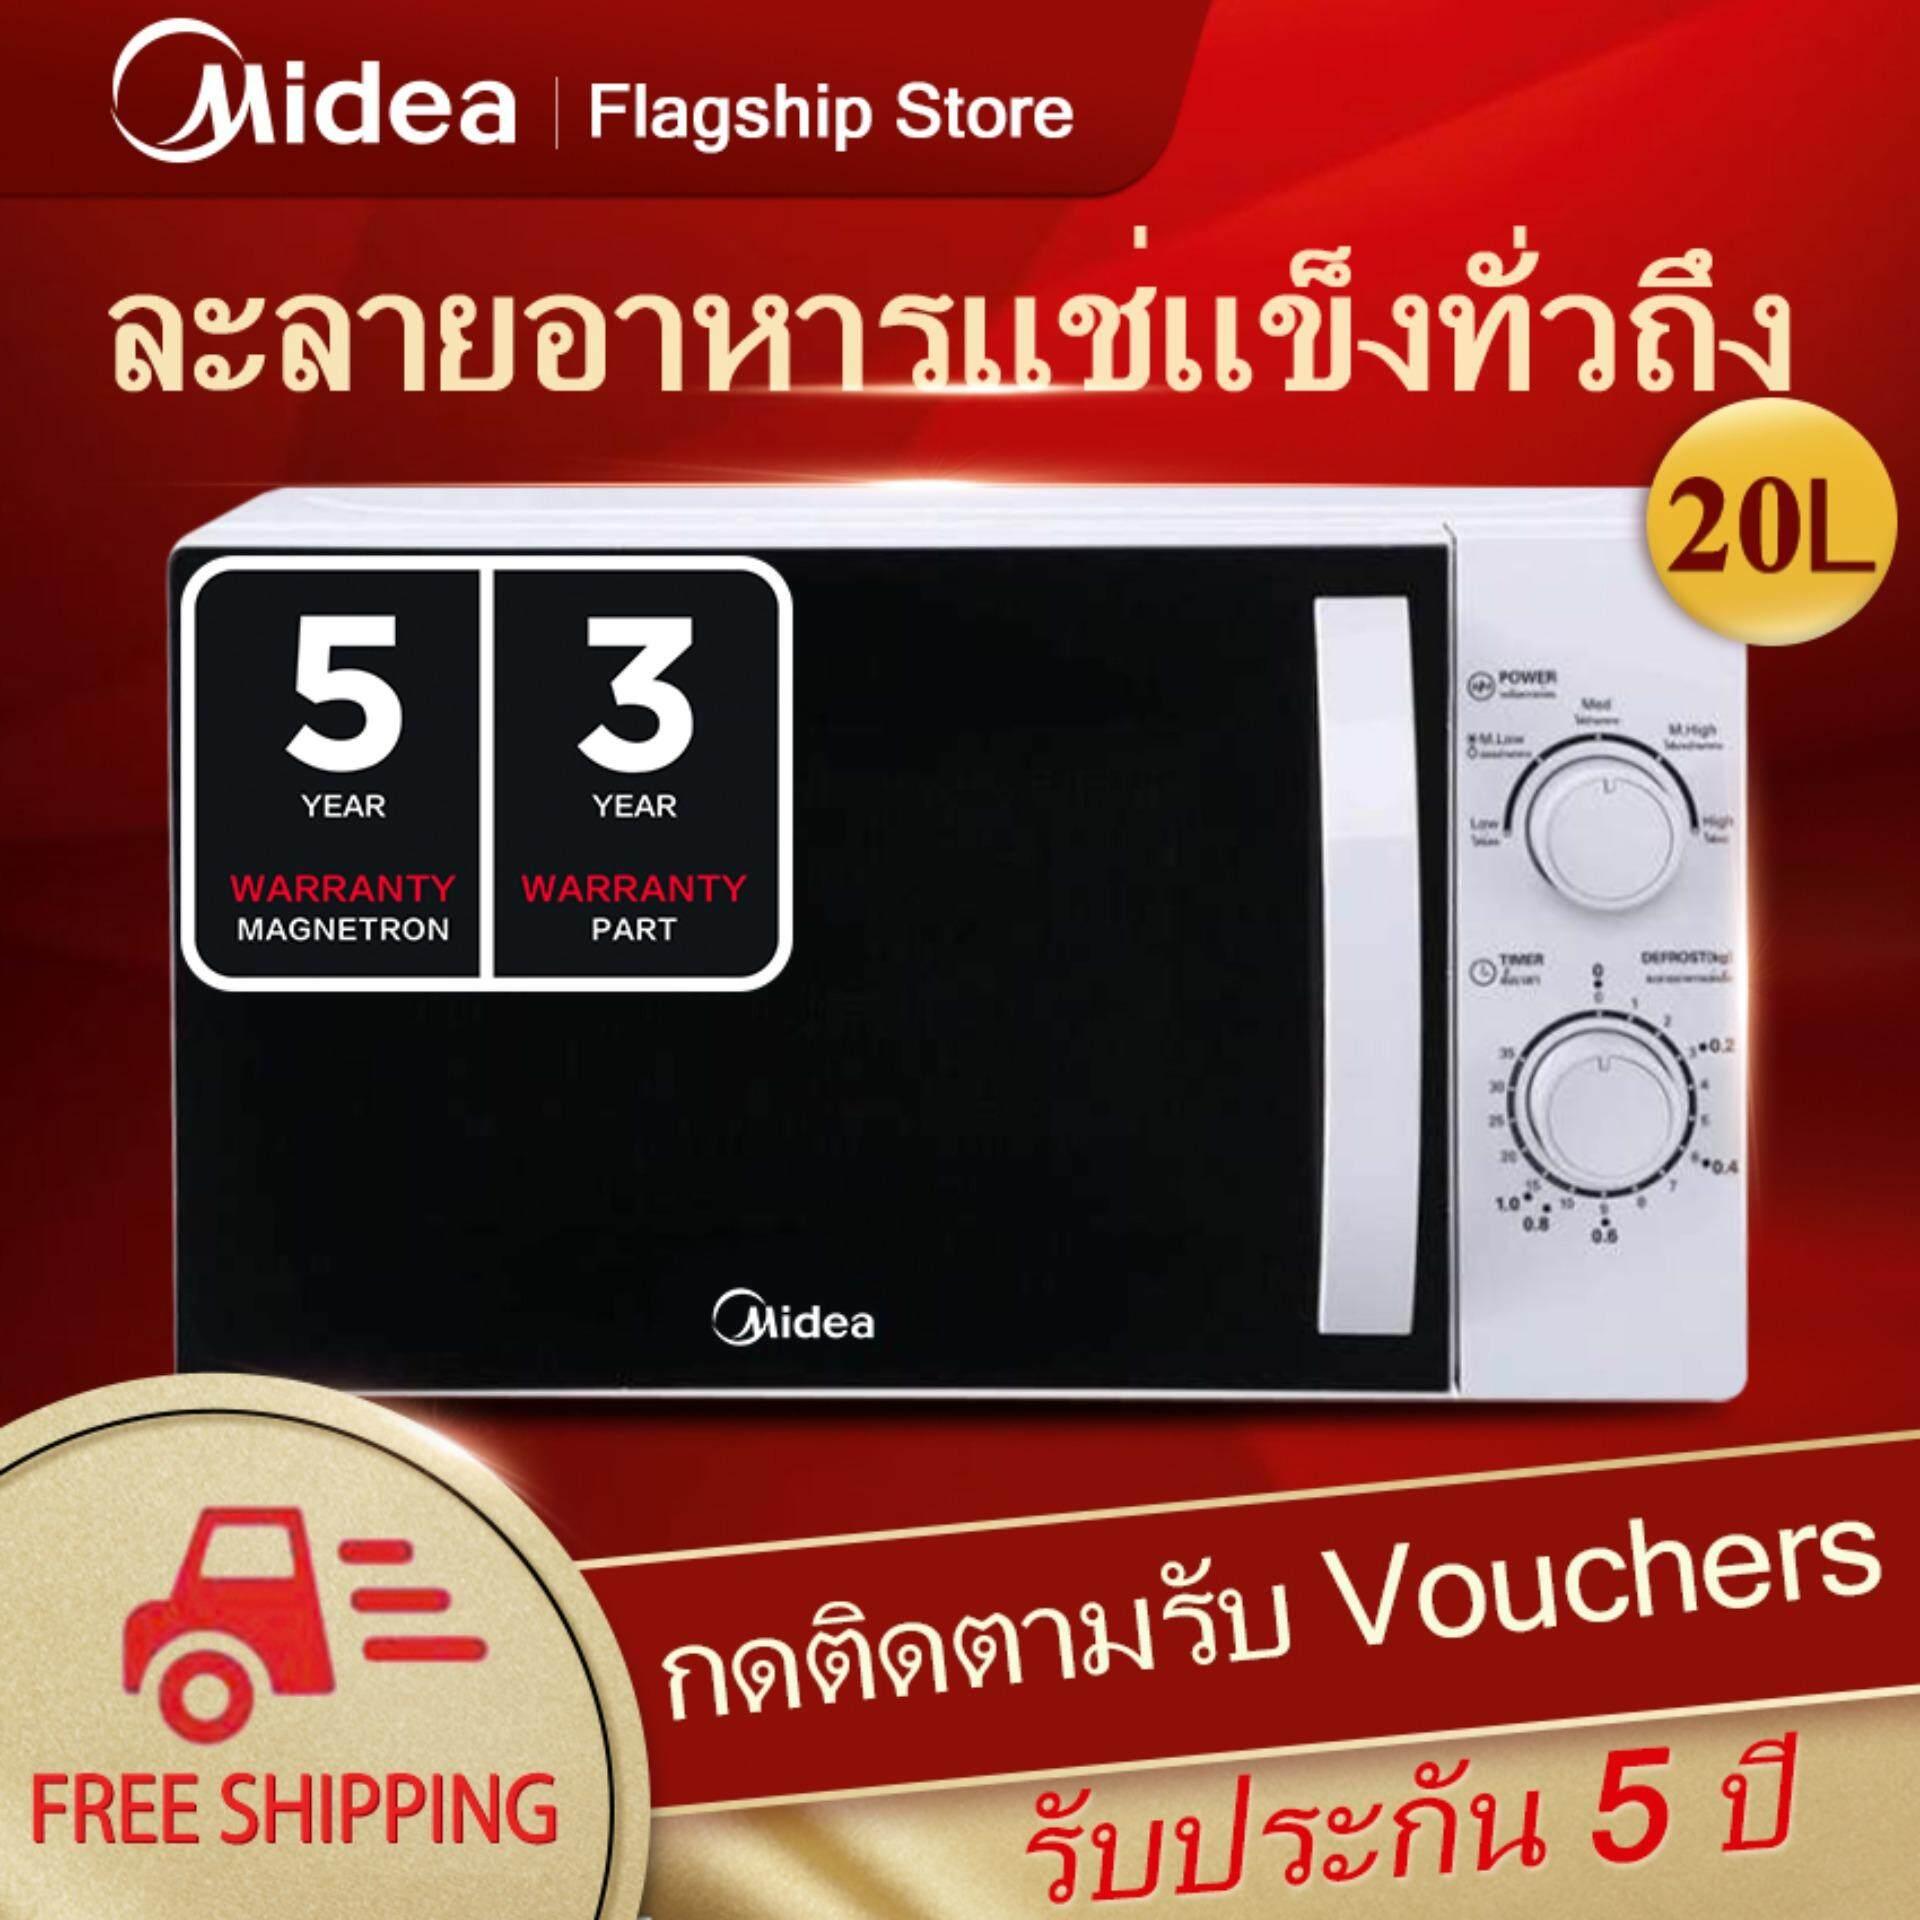 Midea Microwave oven มีเดียไมโครเวฟ กำลังไฟ 700 วัตต์ ความจุ 20 ลิตร รุ่น MMO-20J91